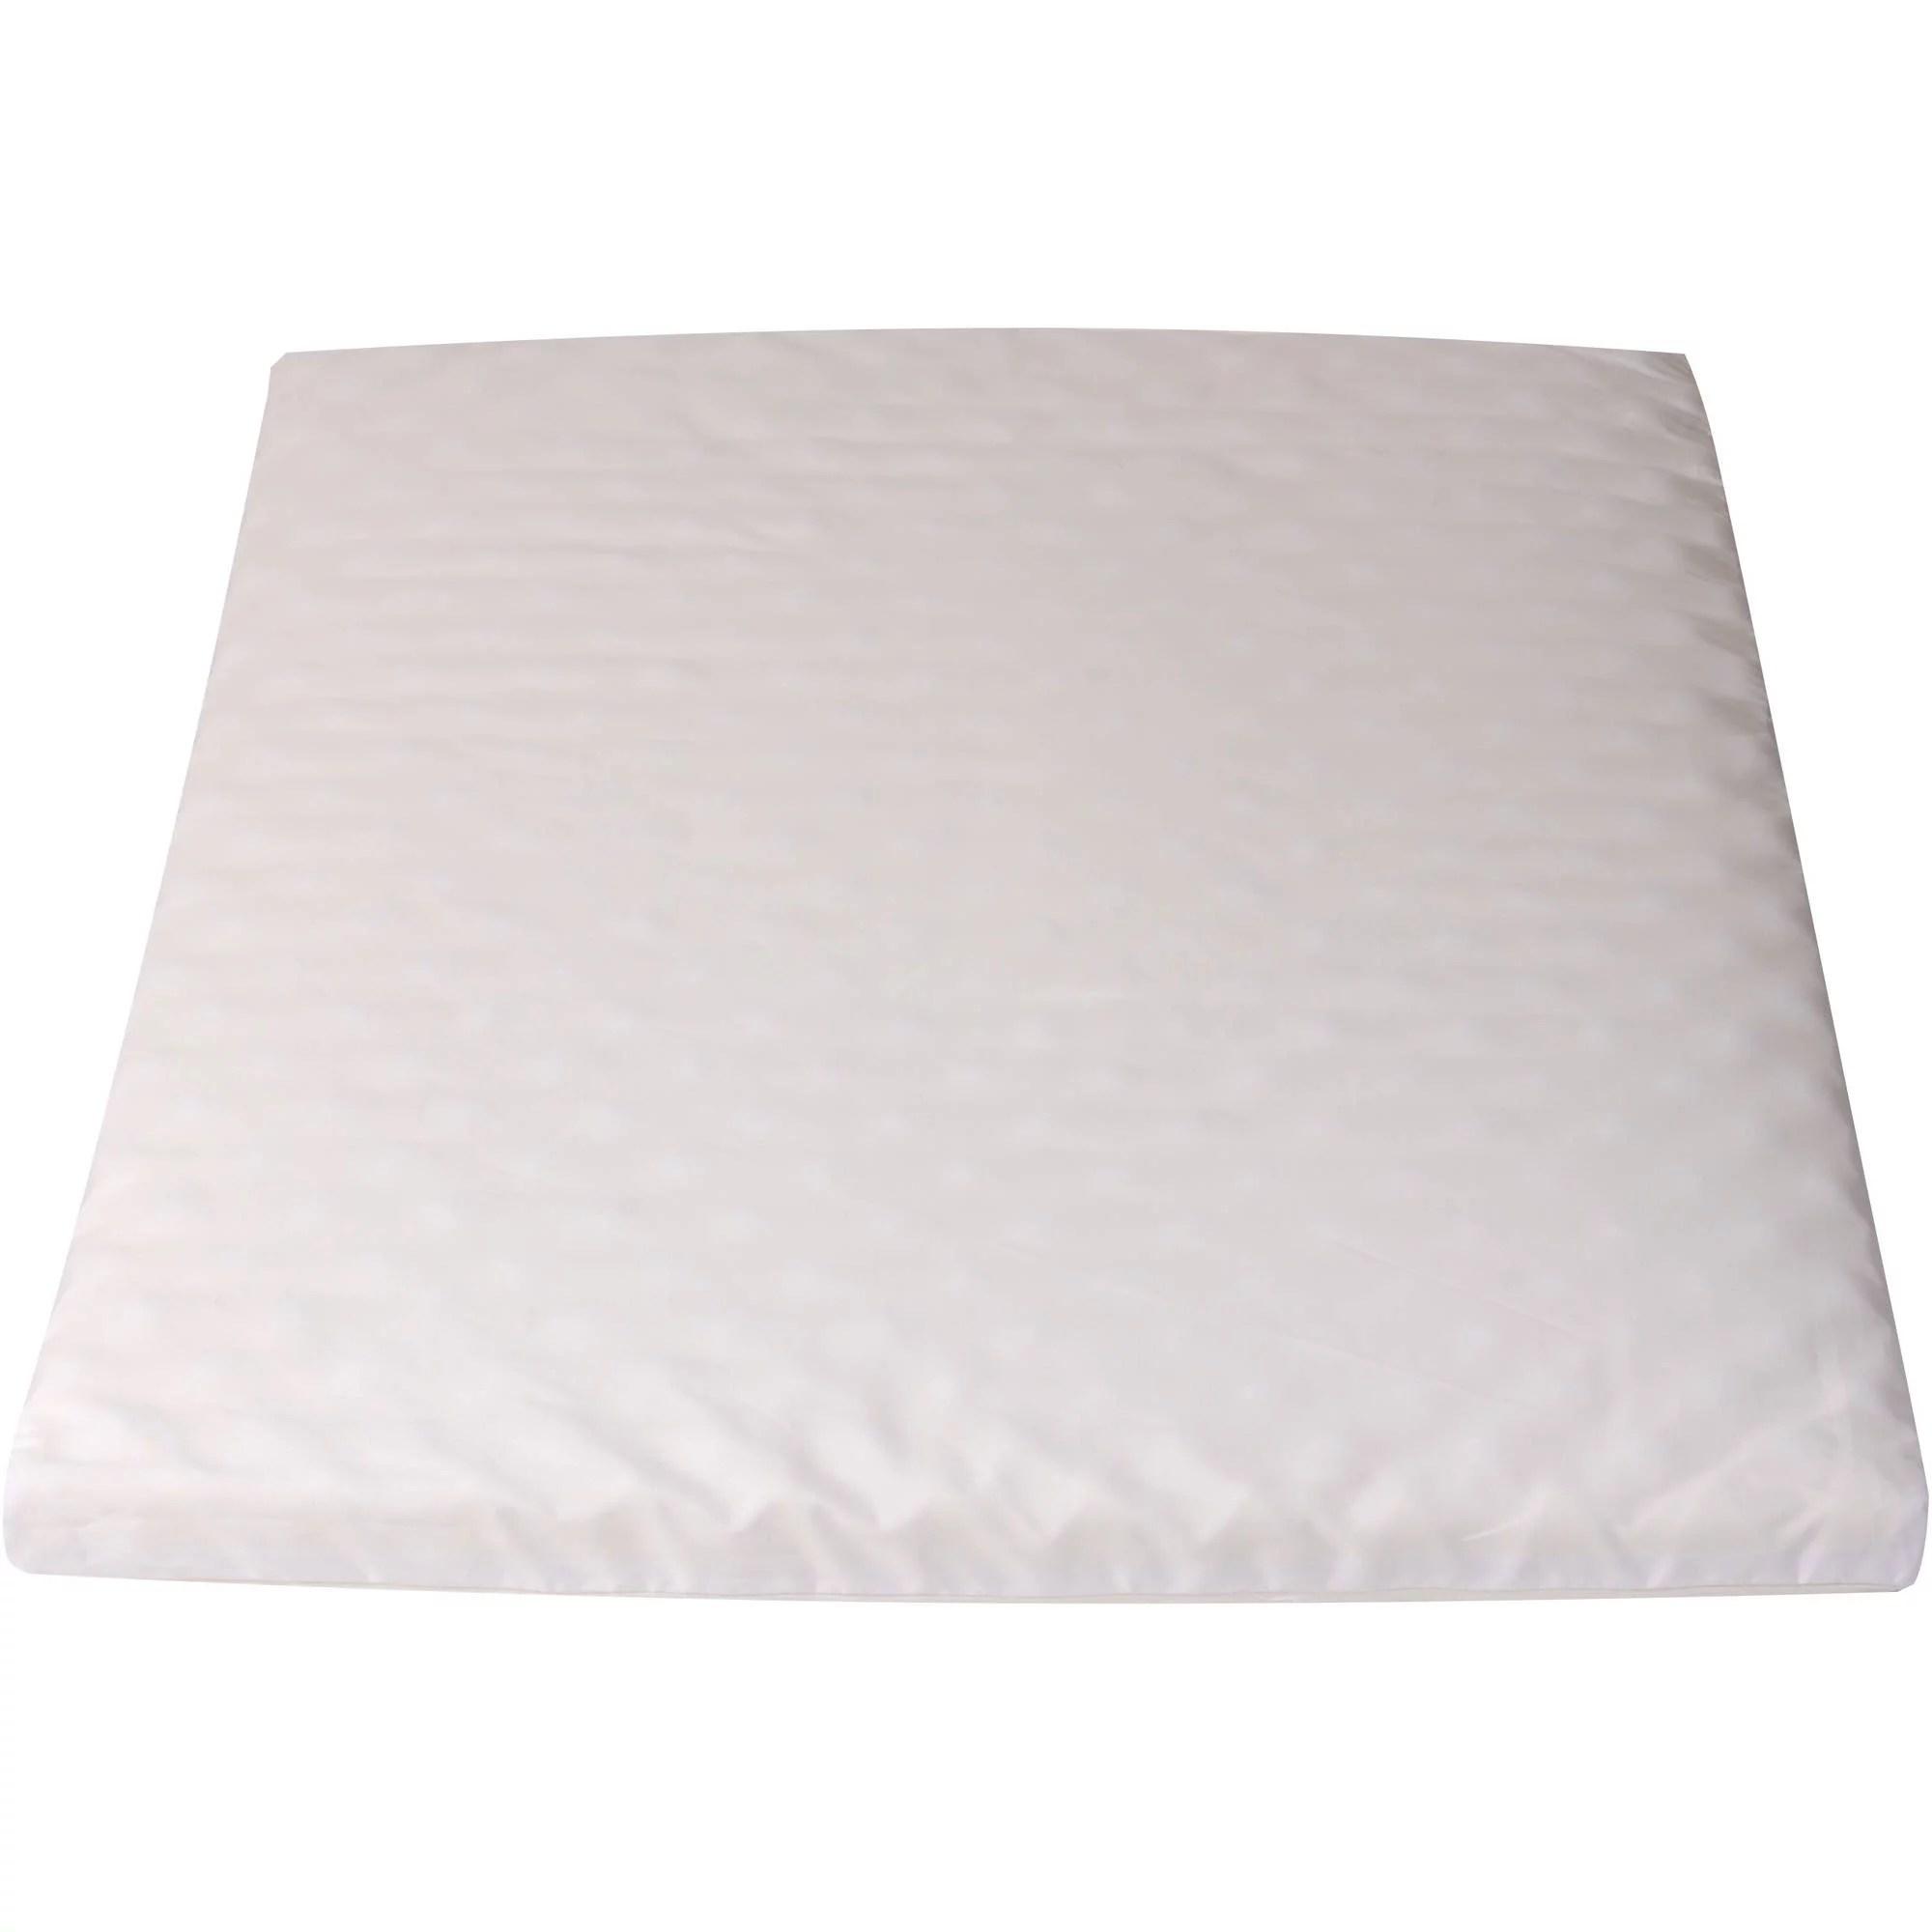 dmi hypoallergenic egg crate foam bed wedge leg rest back support pillow white 4 pack walmart com